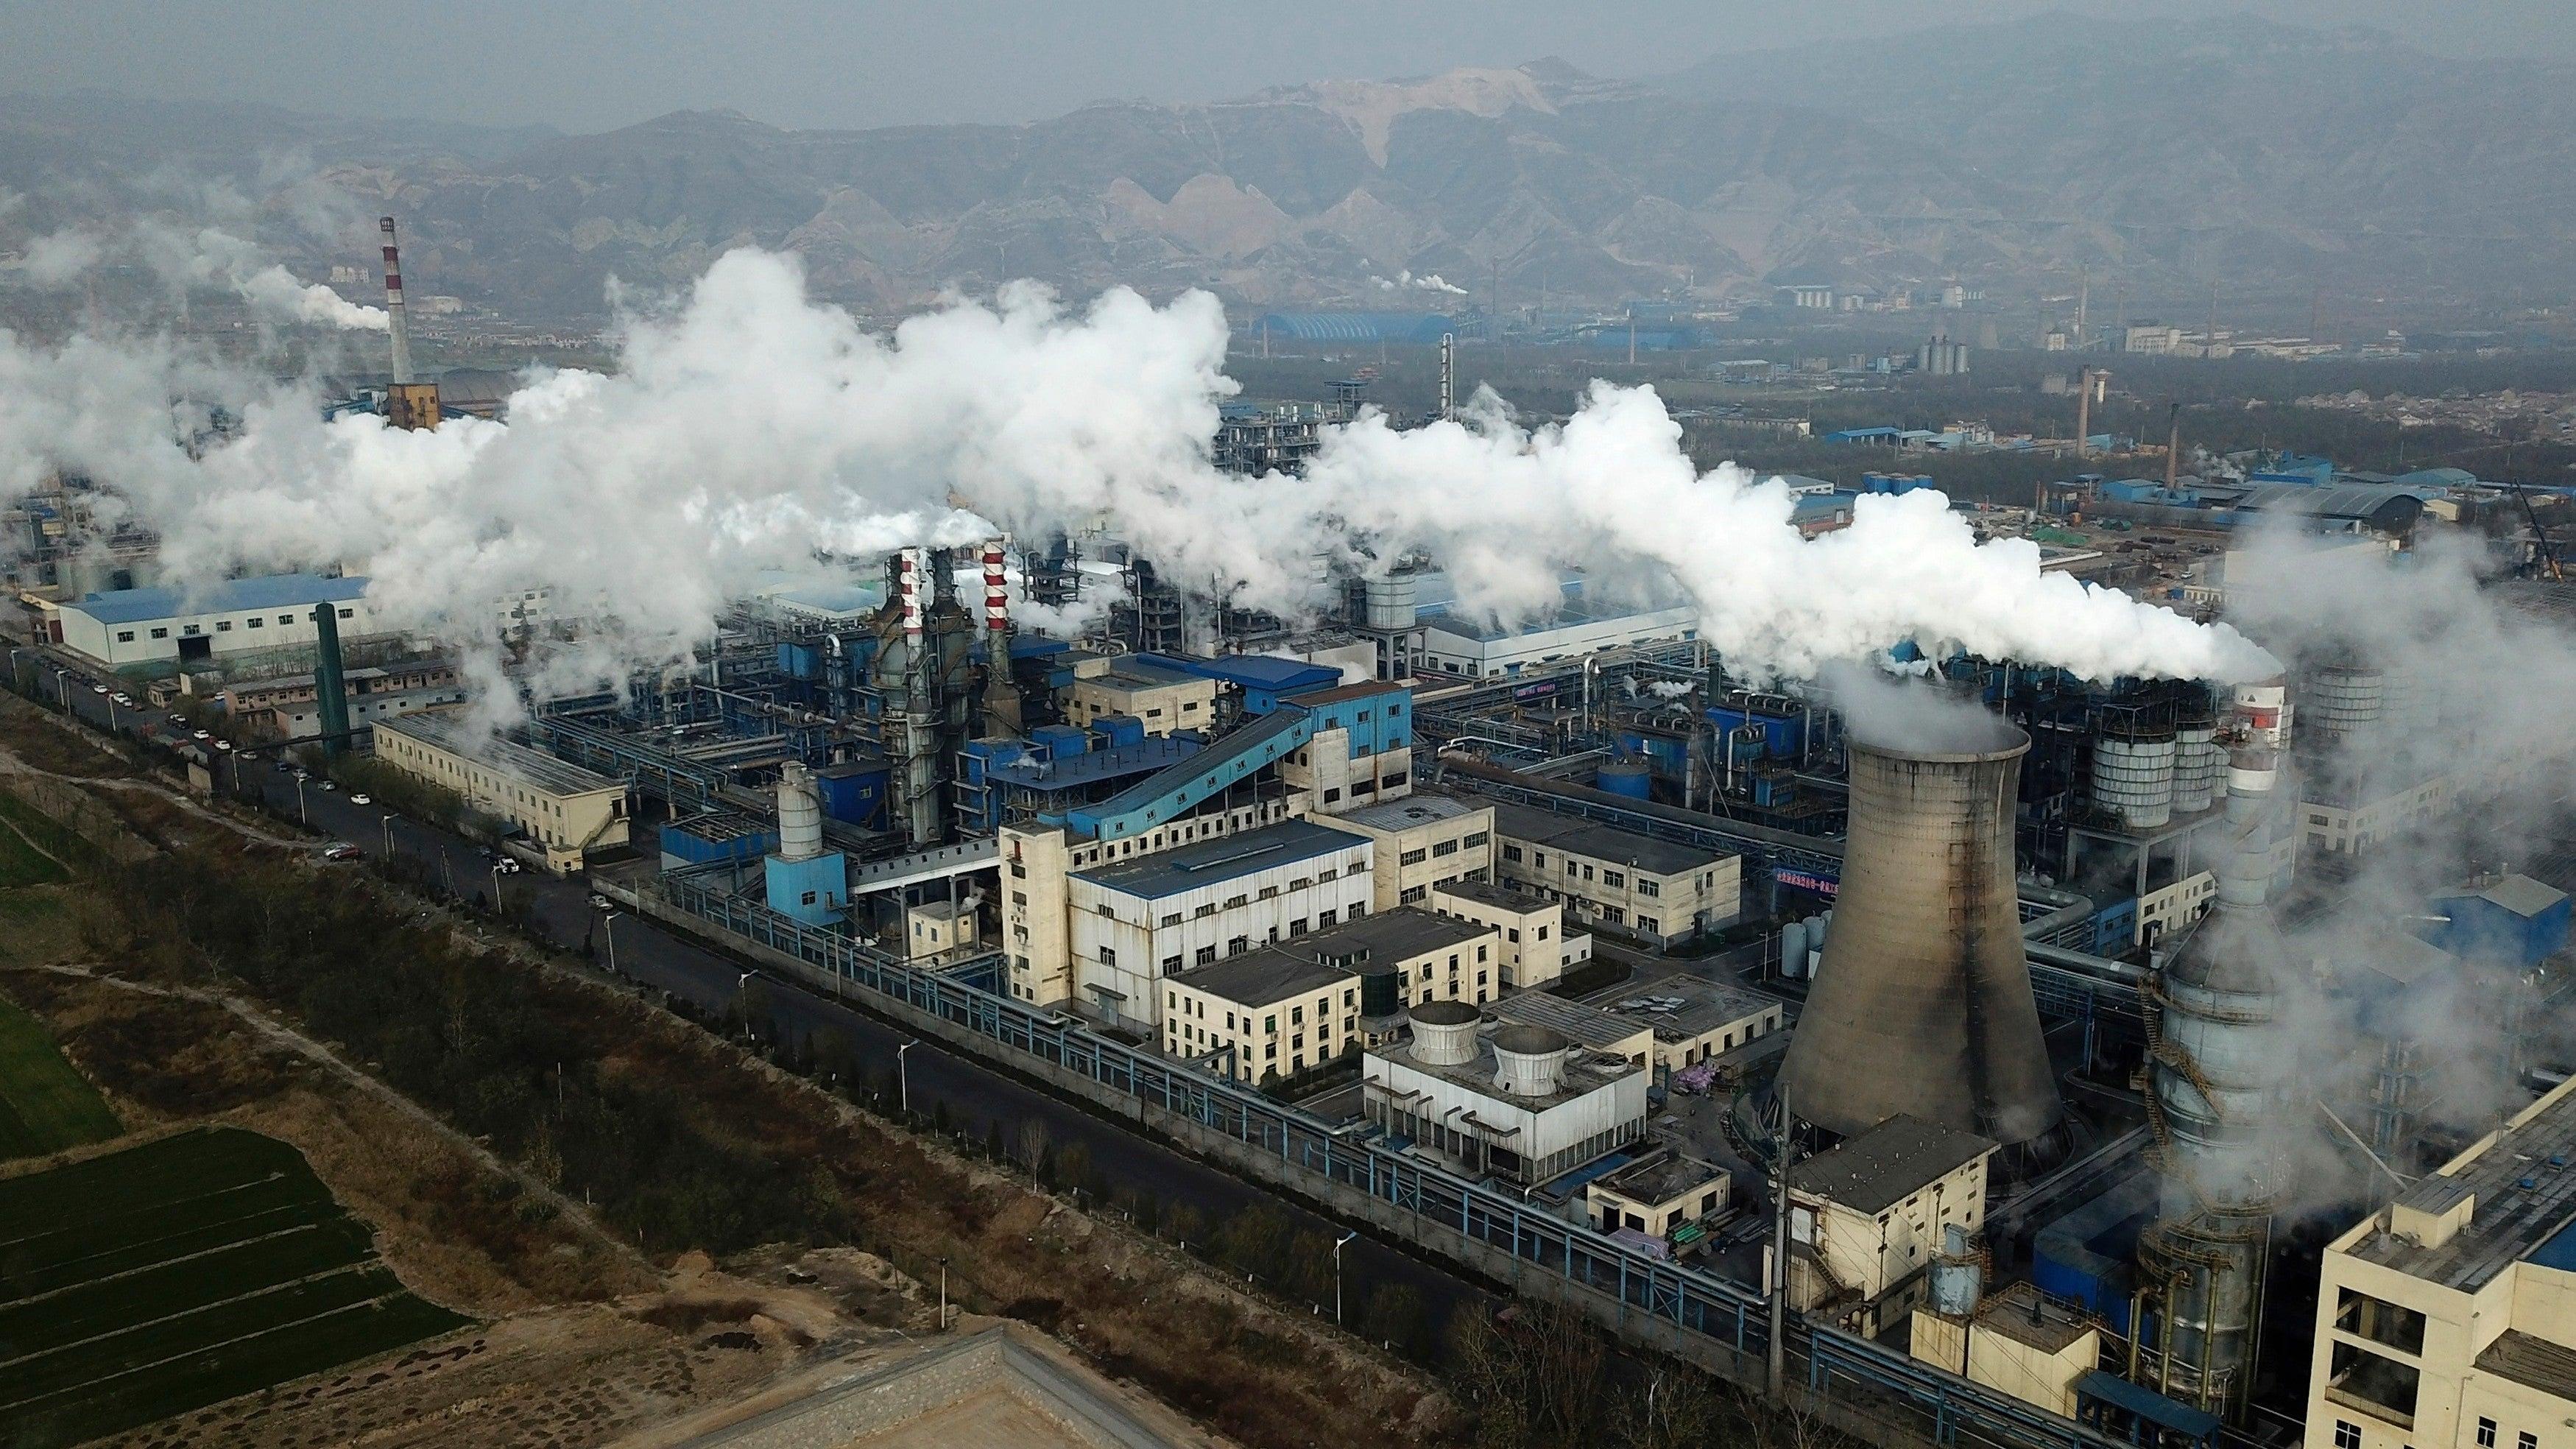 China's Air Pollution Is Already Worse Than Pre-Coronavirus Levels